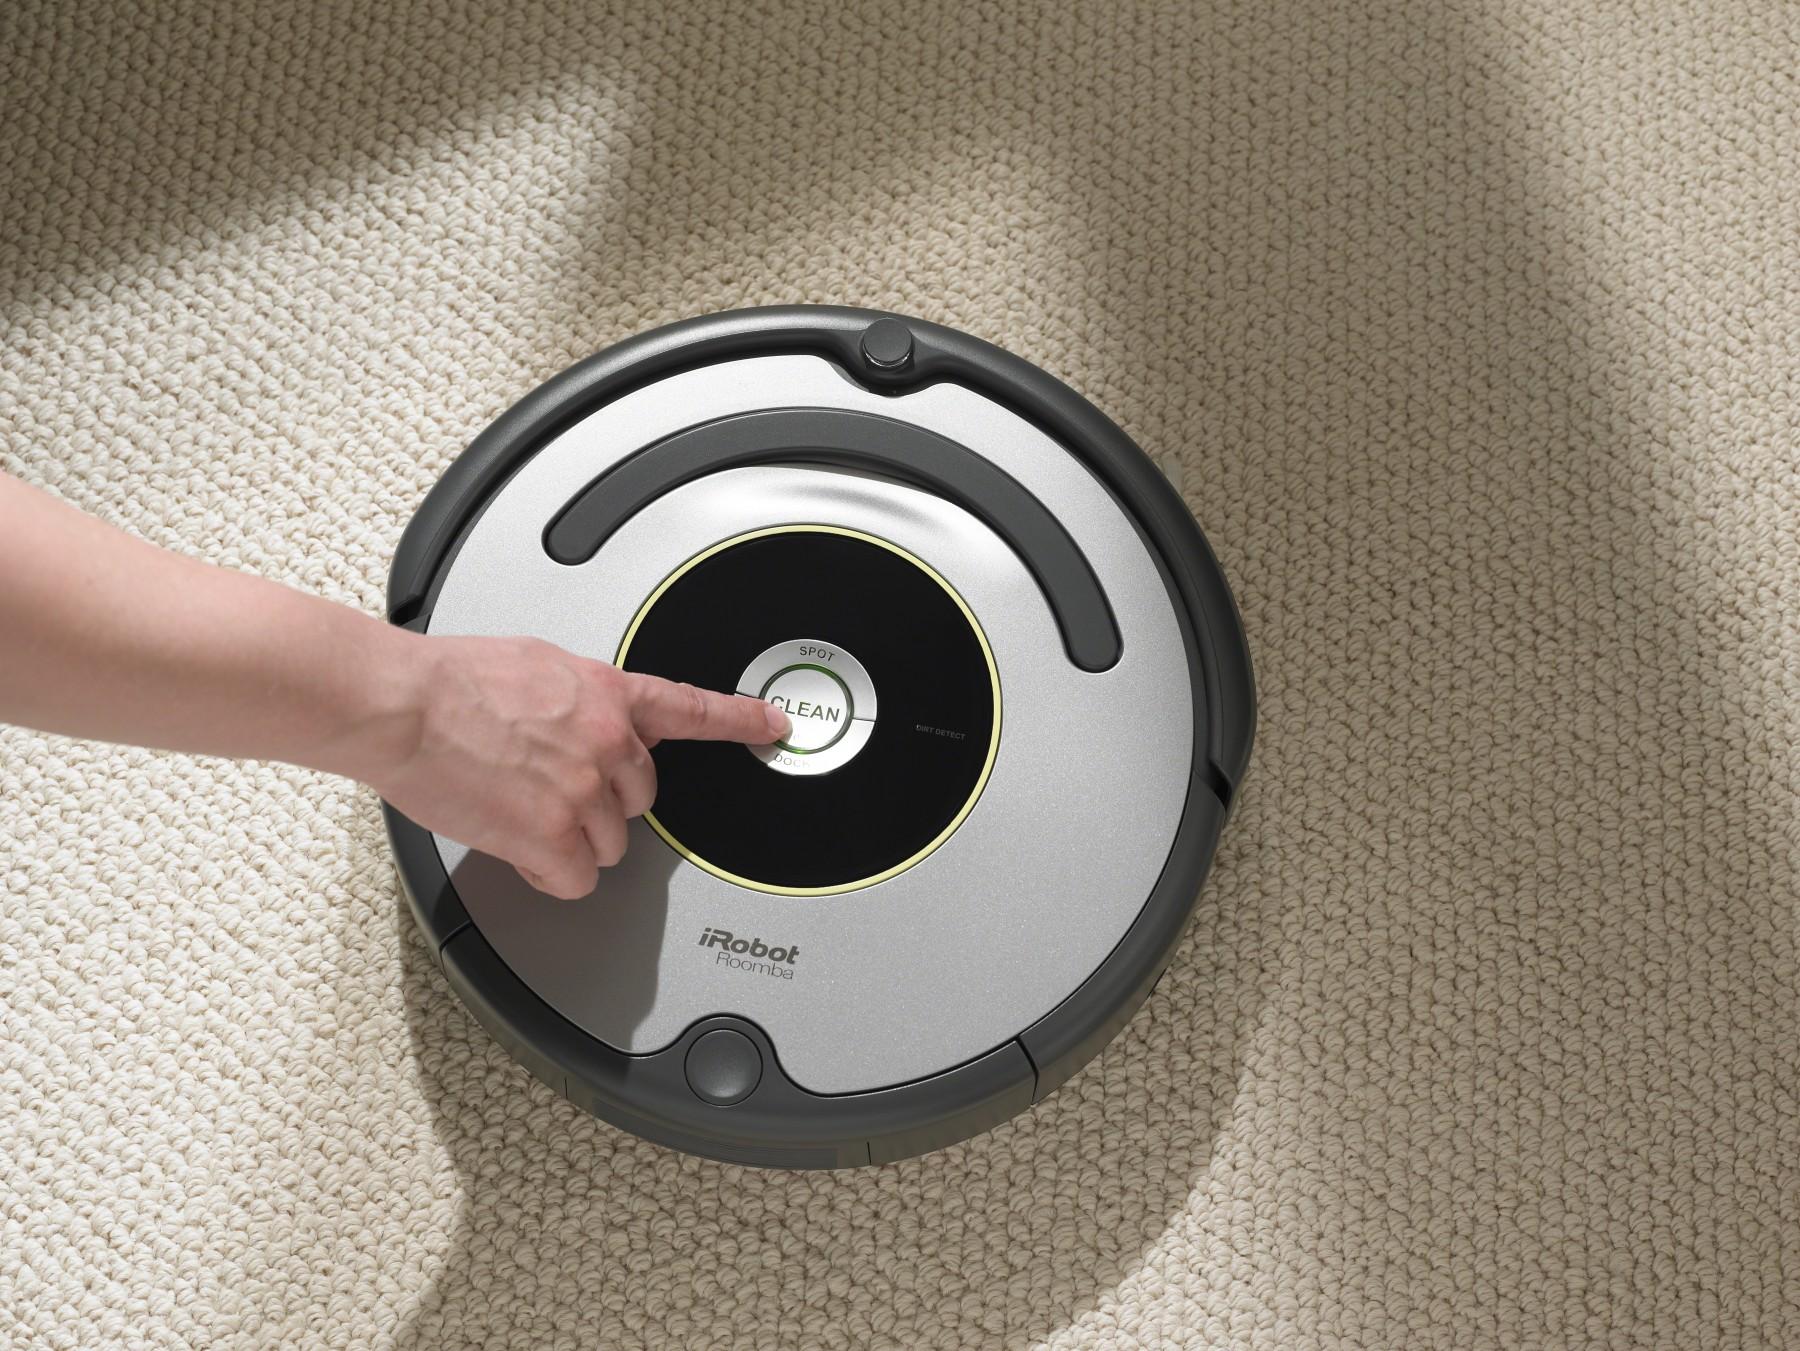 Robot aspirateur Roomba 615 d'iRobot